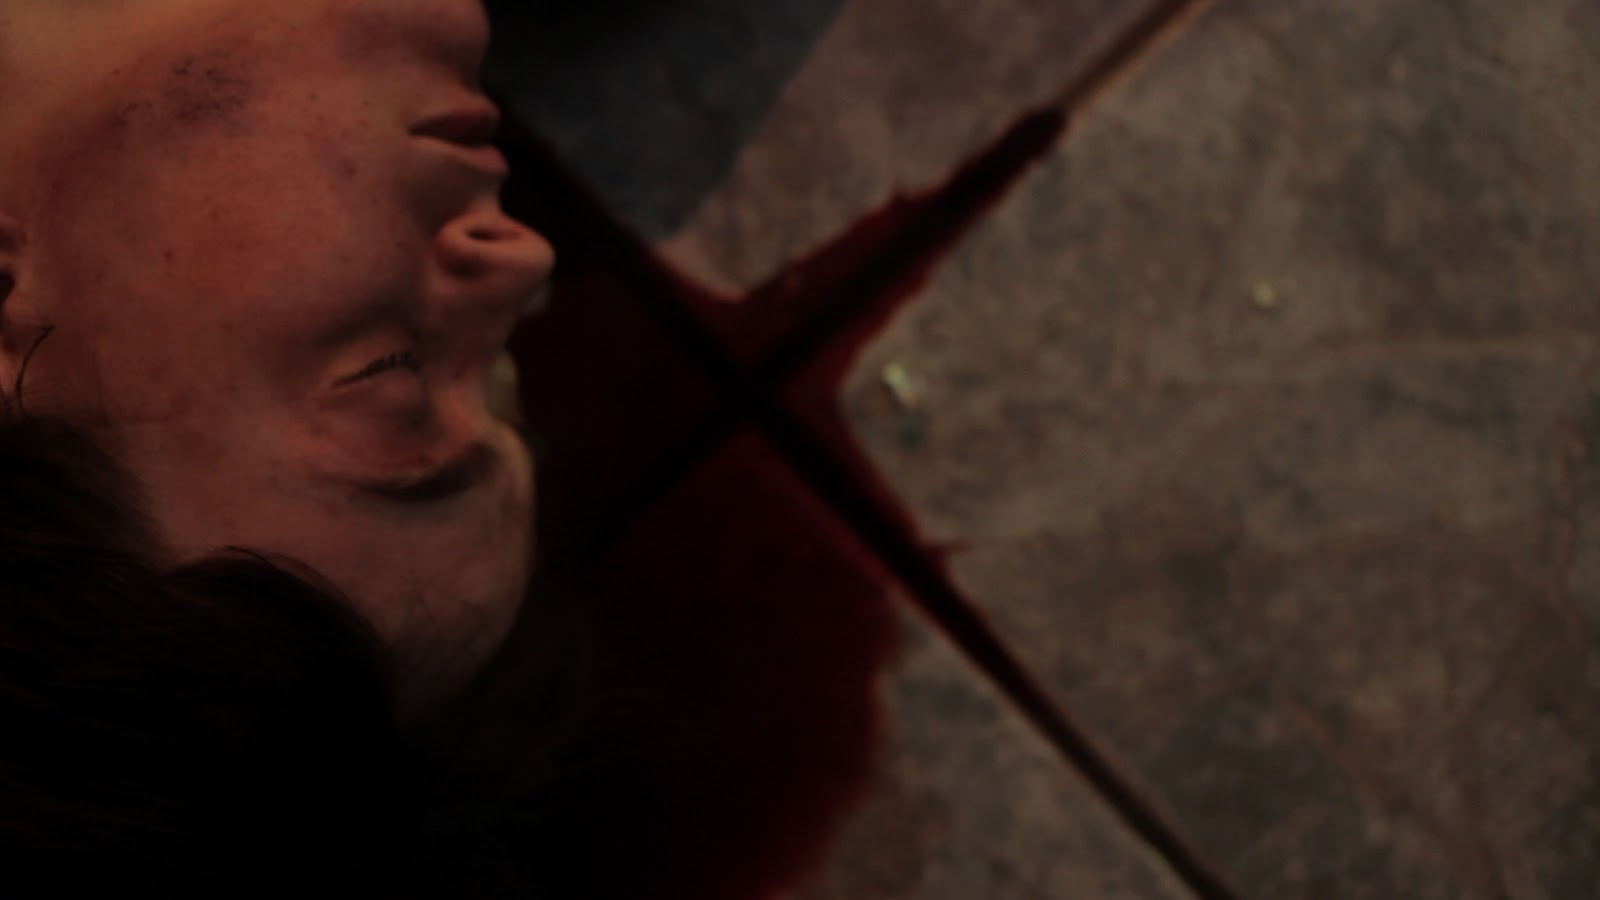 Kayden Rose Floor Blood Copyright B Lemire.jpg